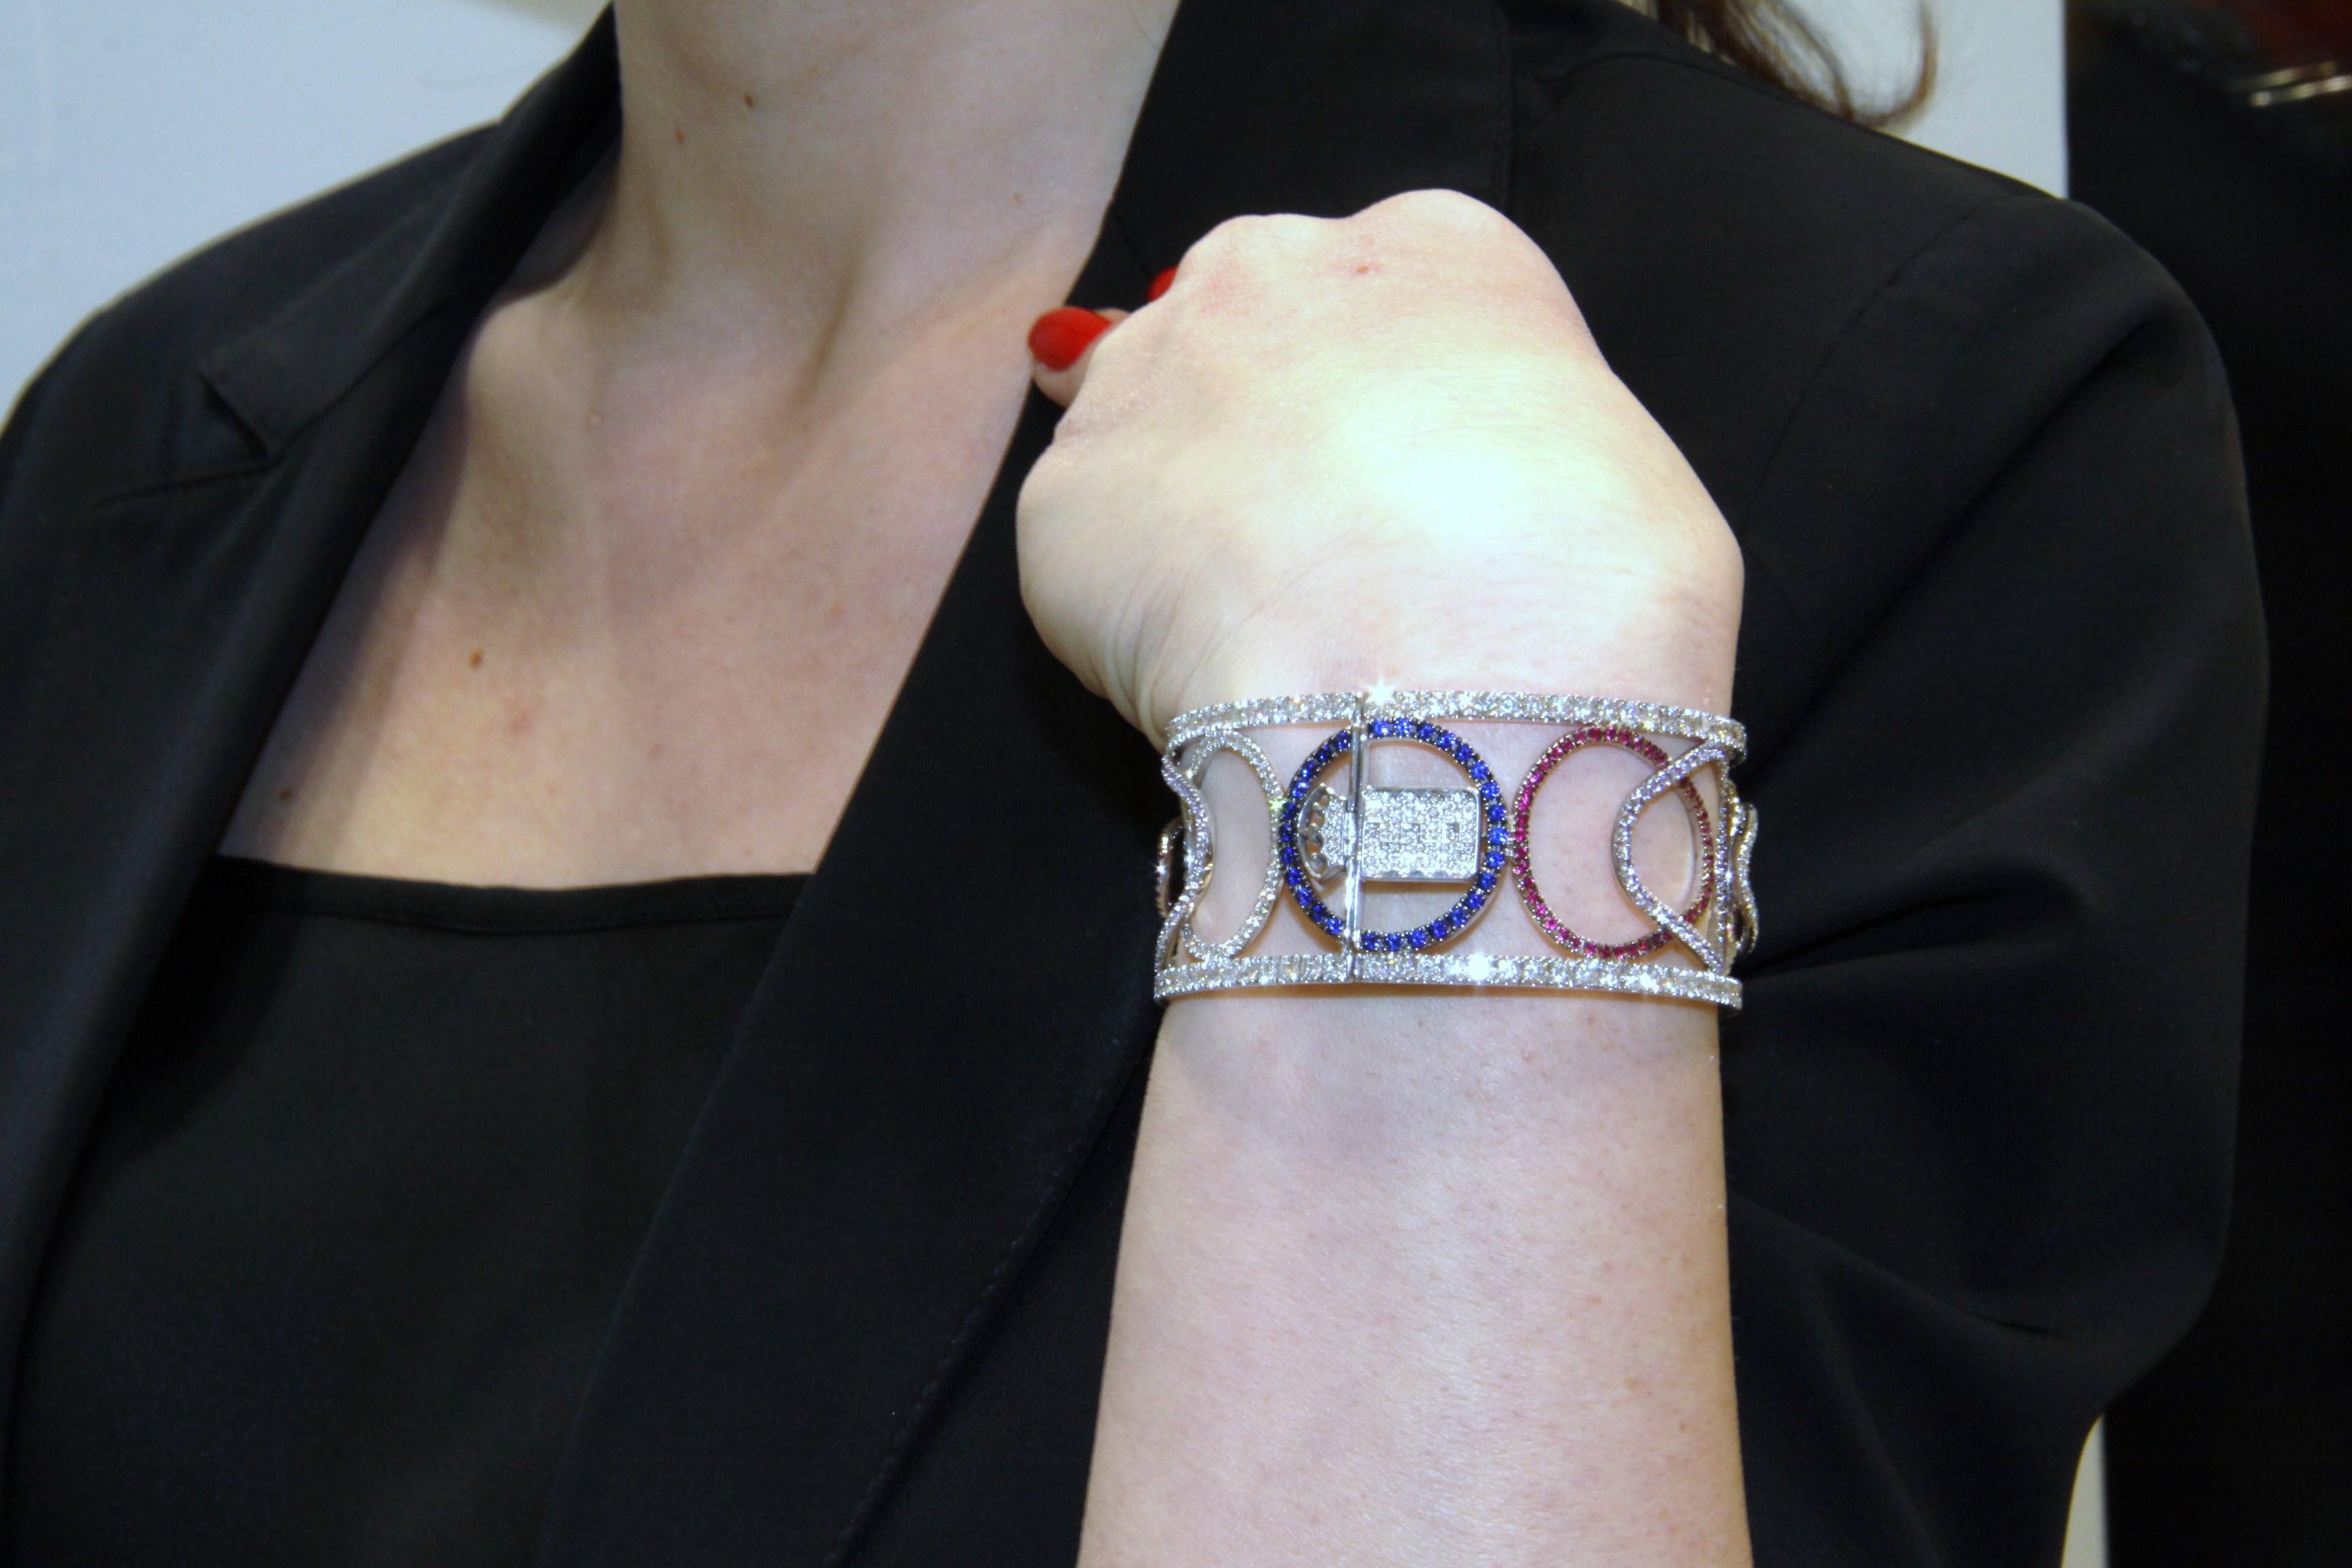 Taormina bracelet set in white gold with sapphires, rubies, diamonds, Di Gregorio Gioielli